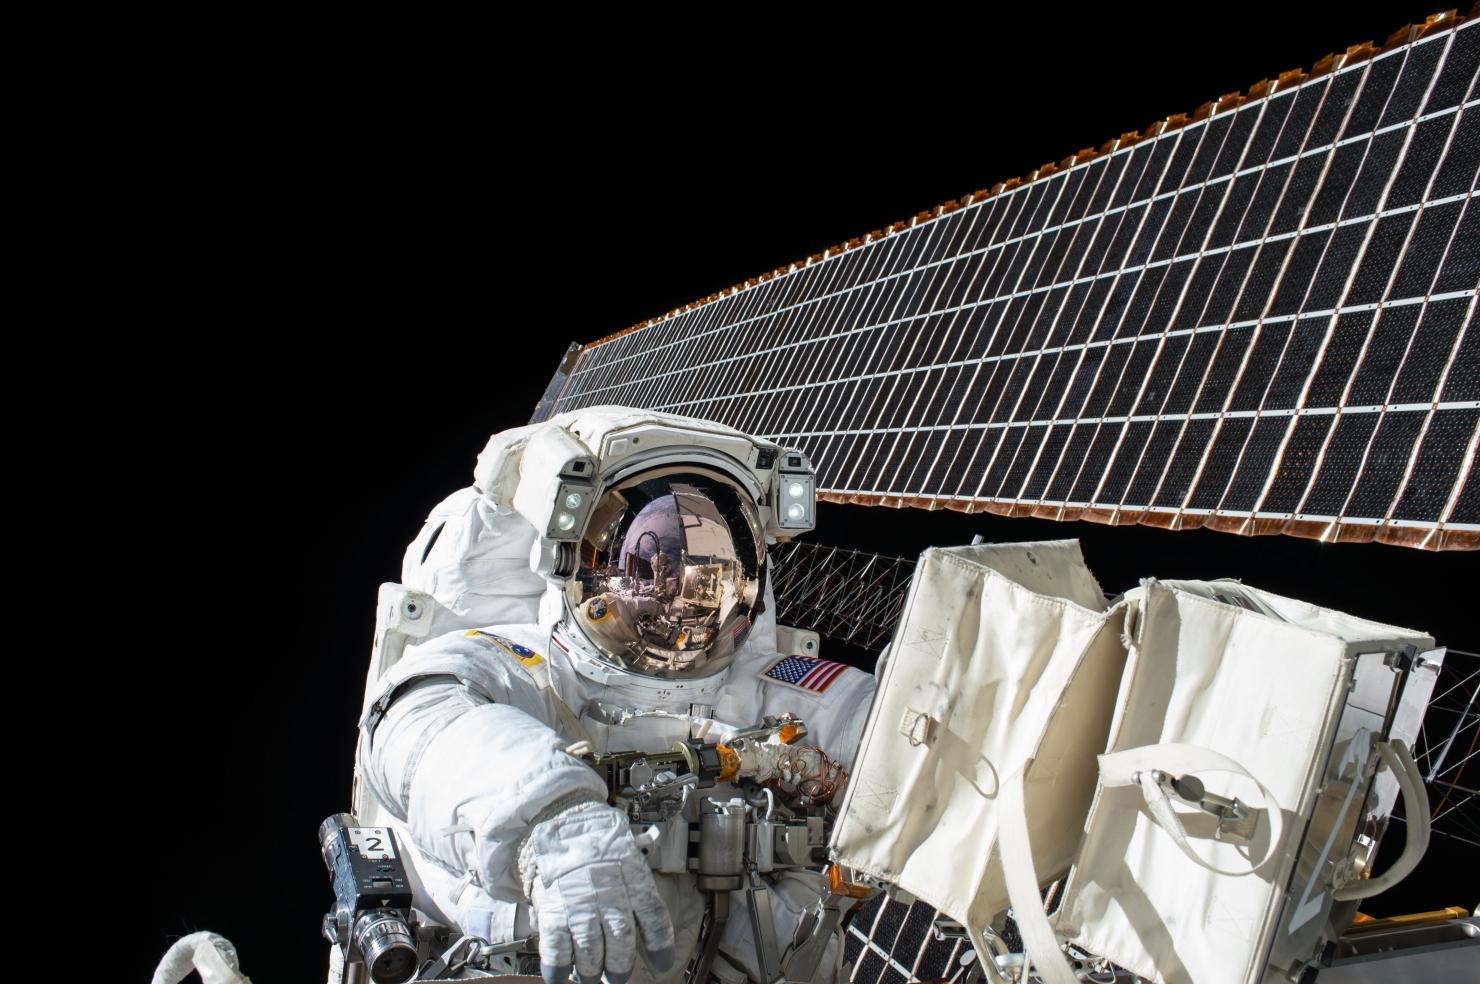 Scott Kelly - Mers în spațiu